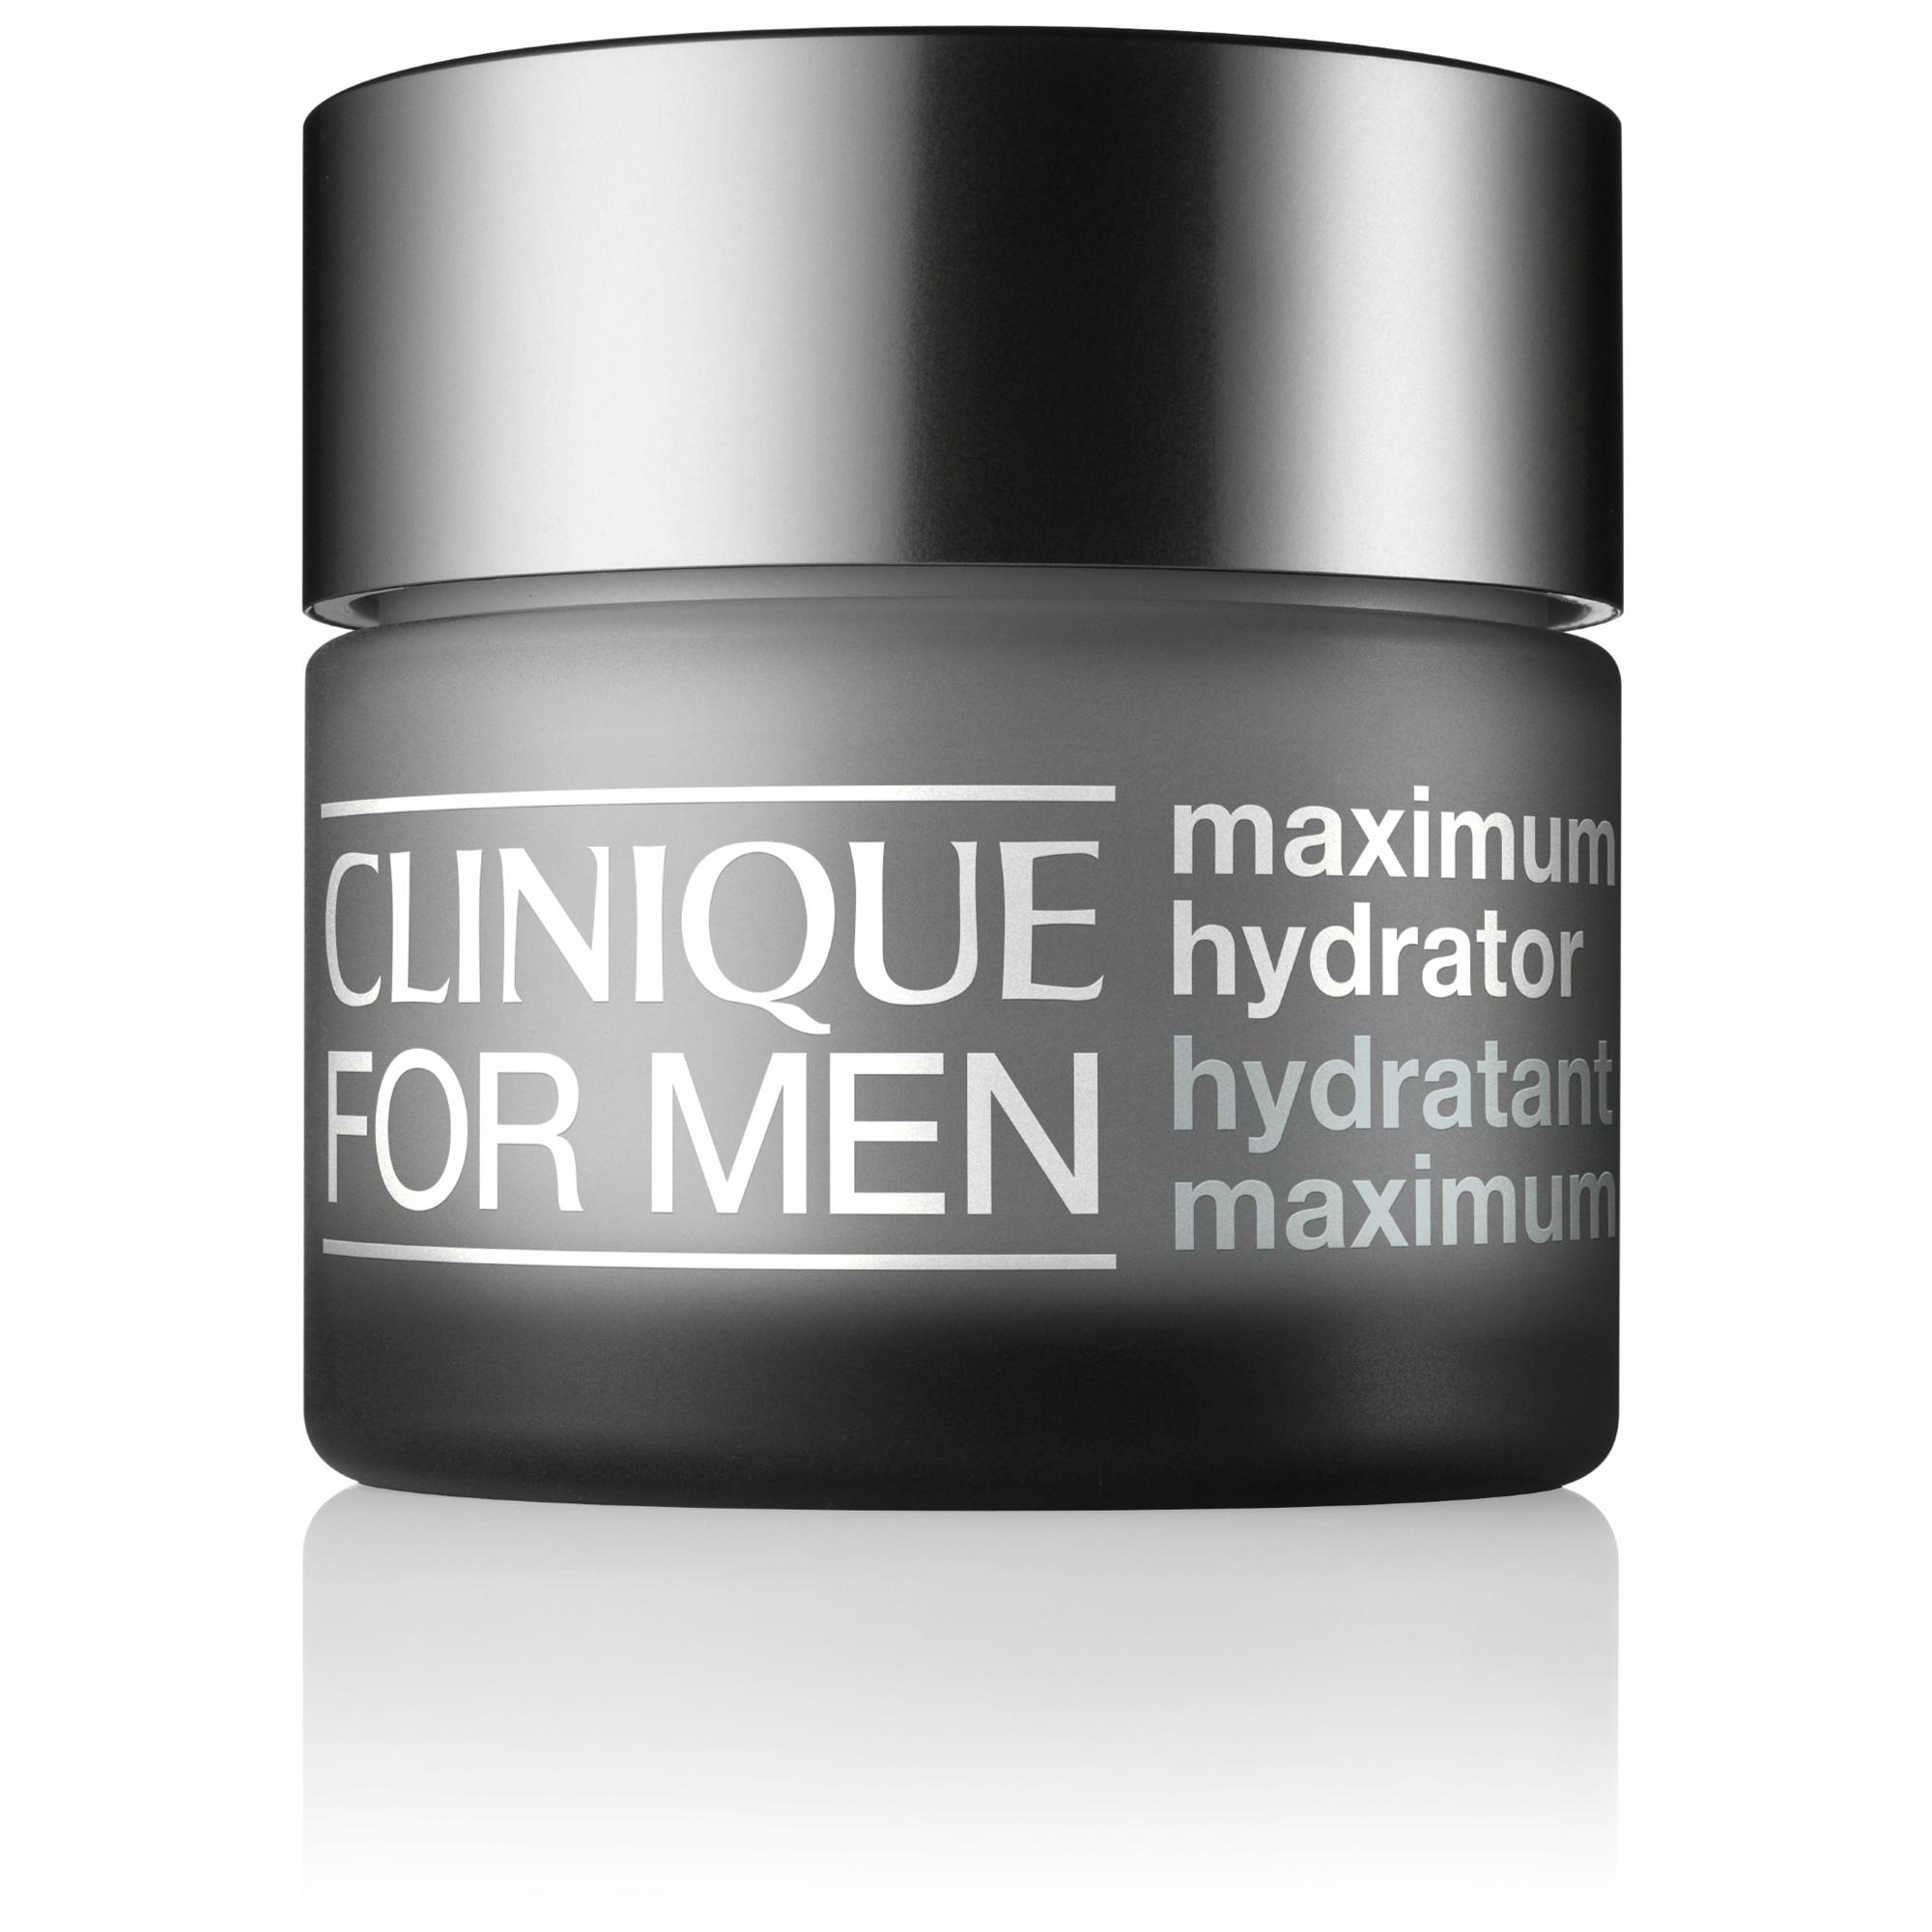 CLI FOR MEN MAXIMUM HYDRATOR